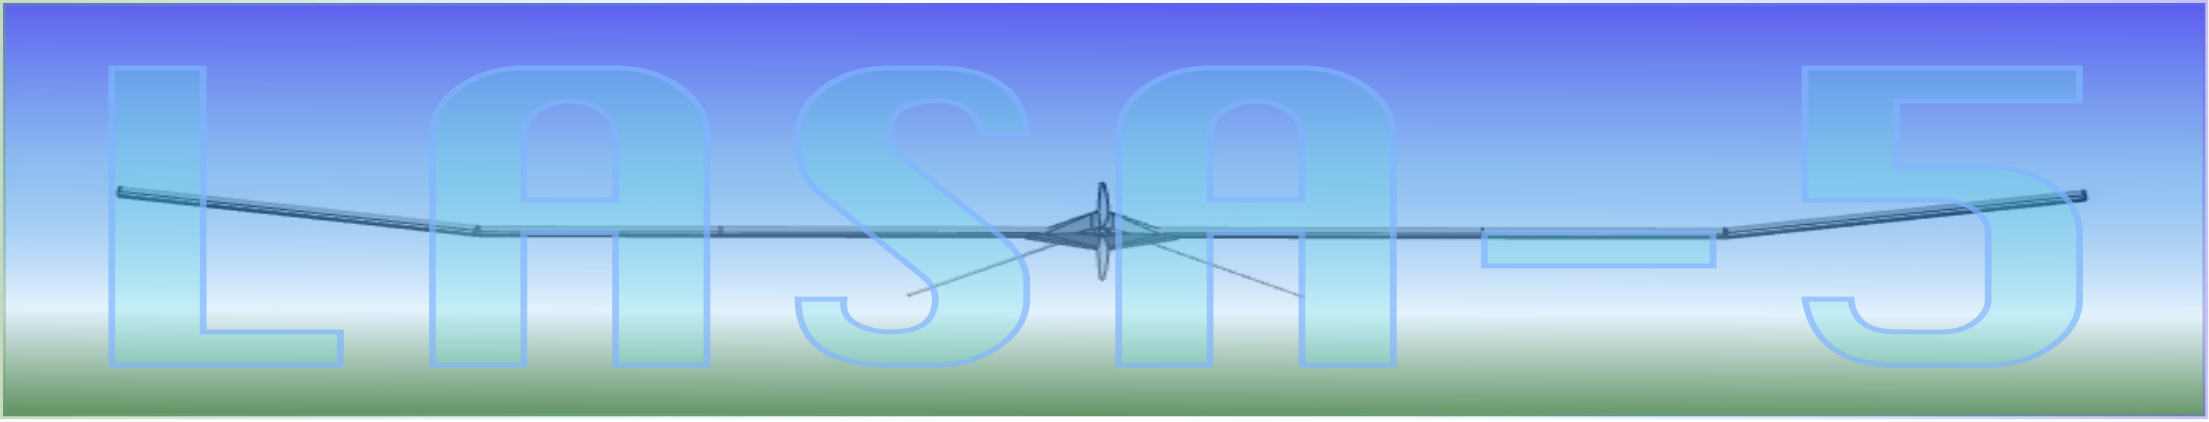 LASA-5 logo